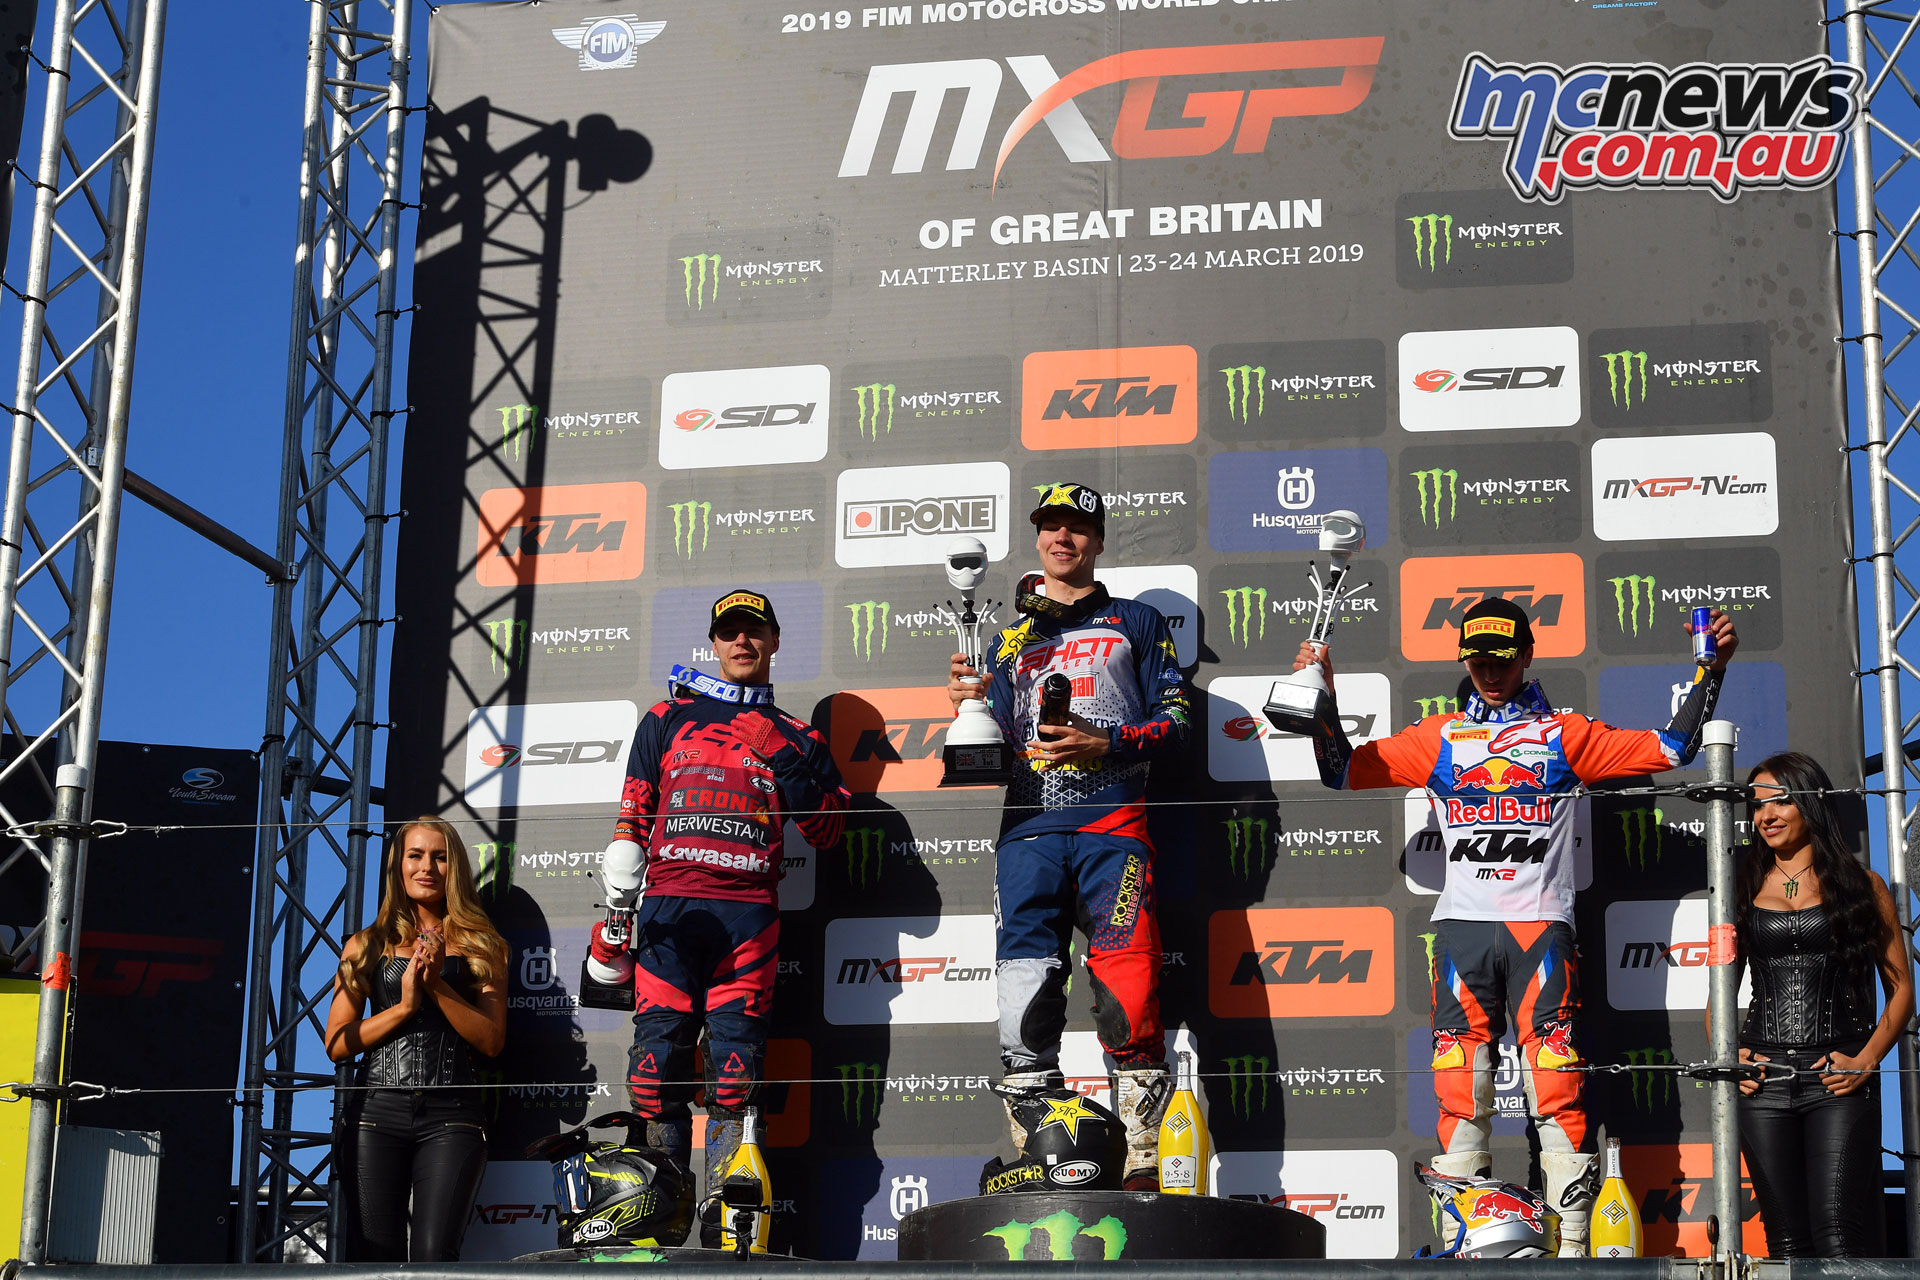 MXGP UK olsen podium